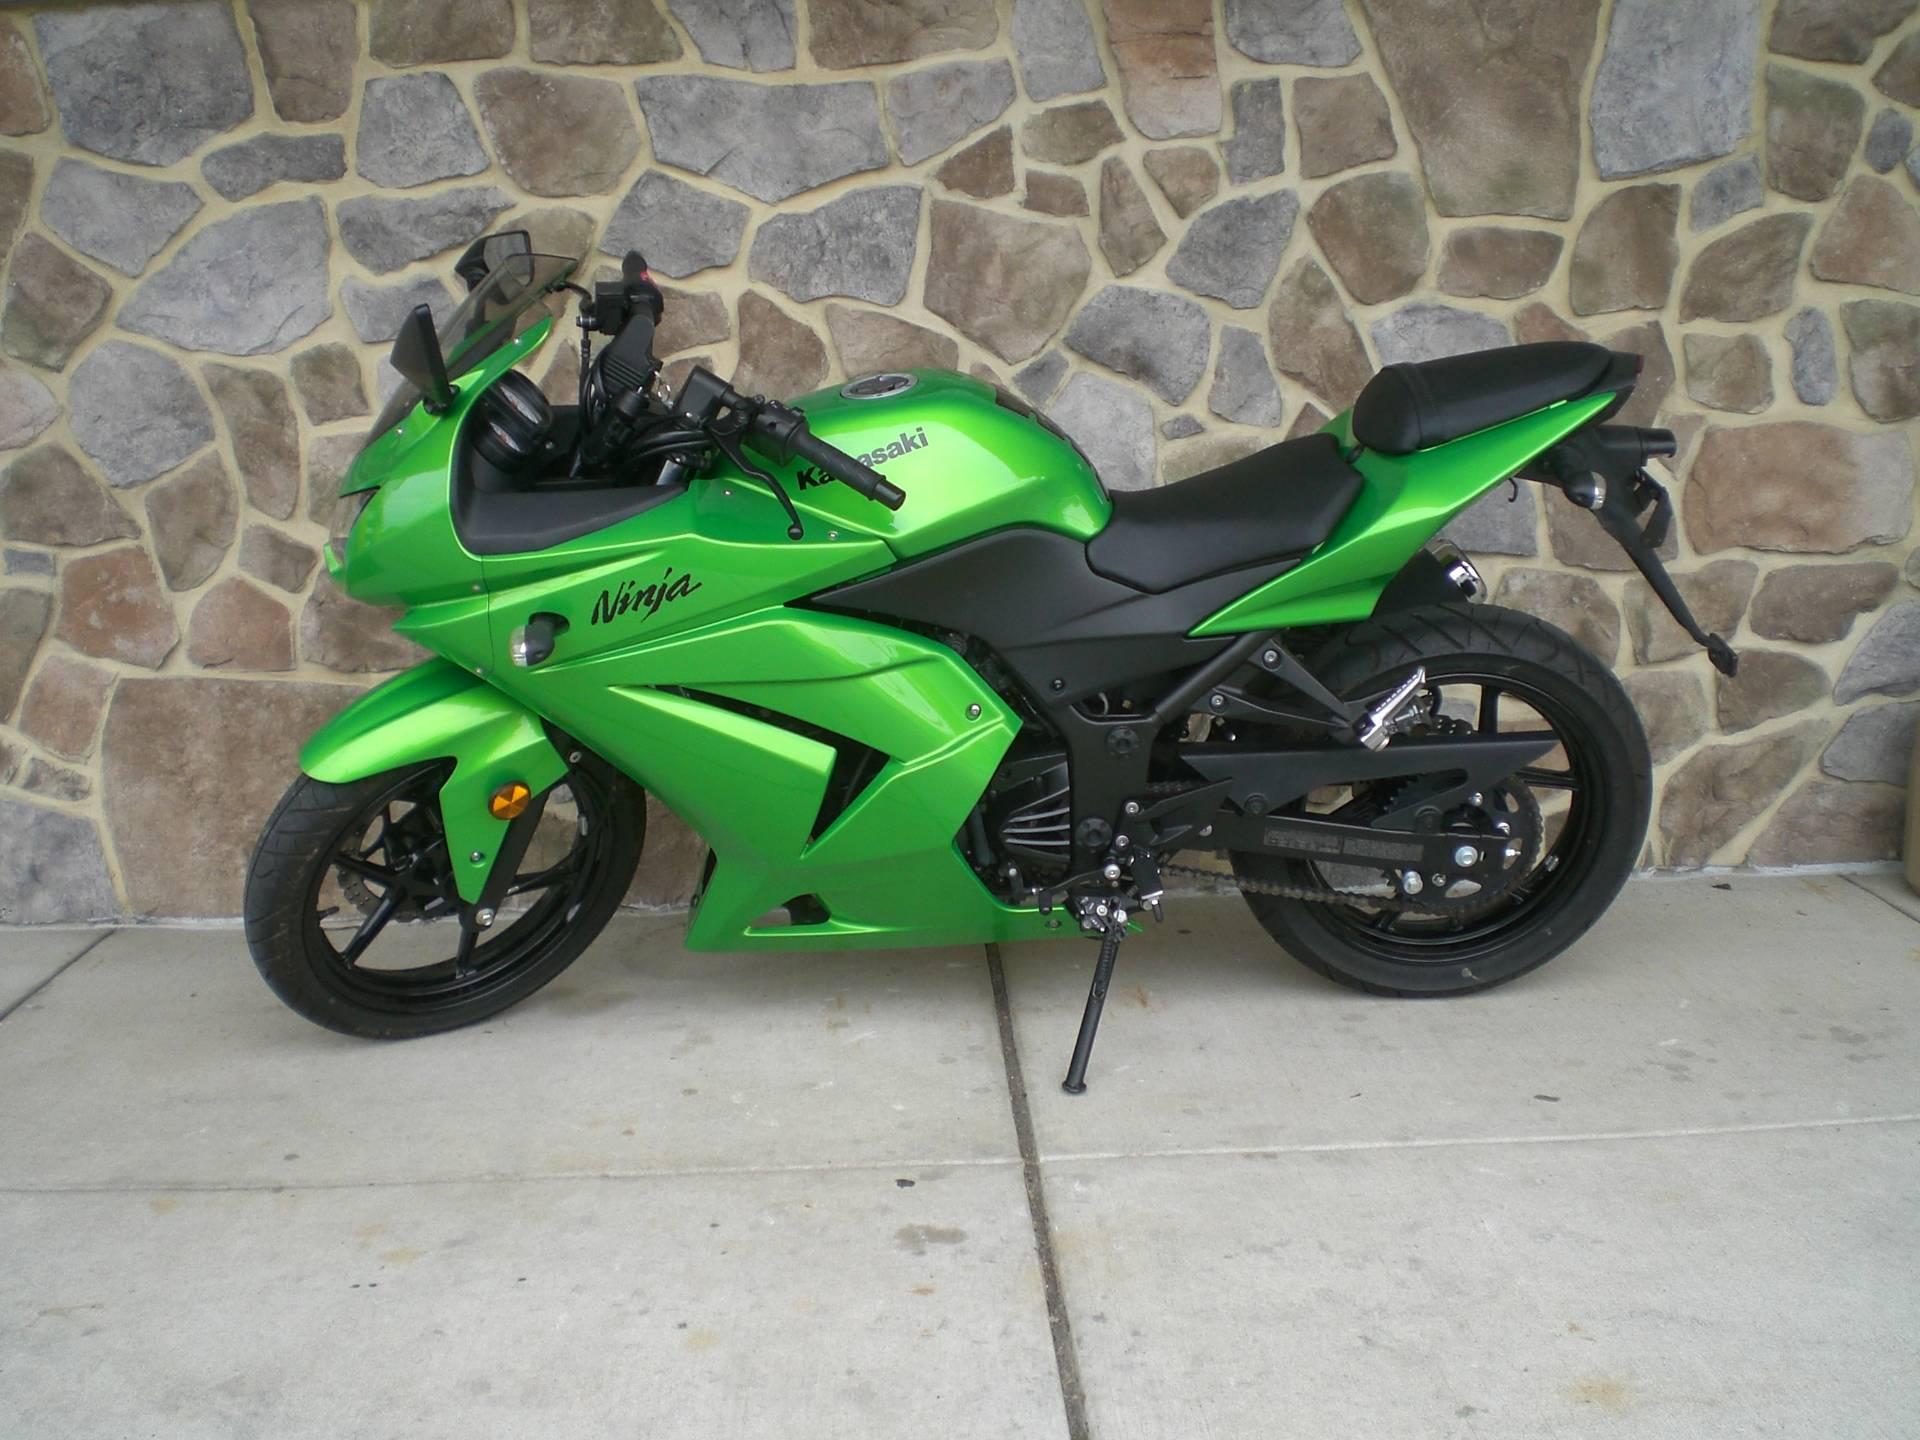 2012 Kawasaki Ninja® 250R in Manheim, Pennsylvania